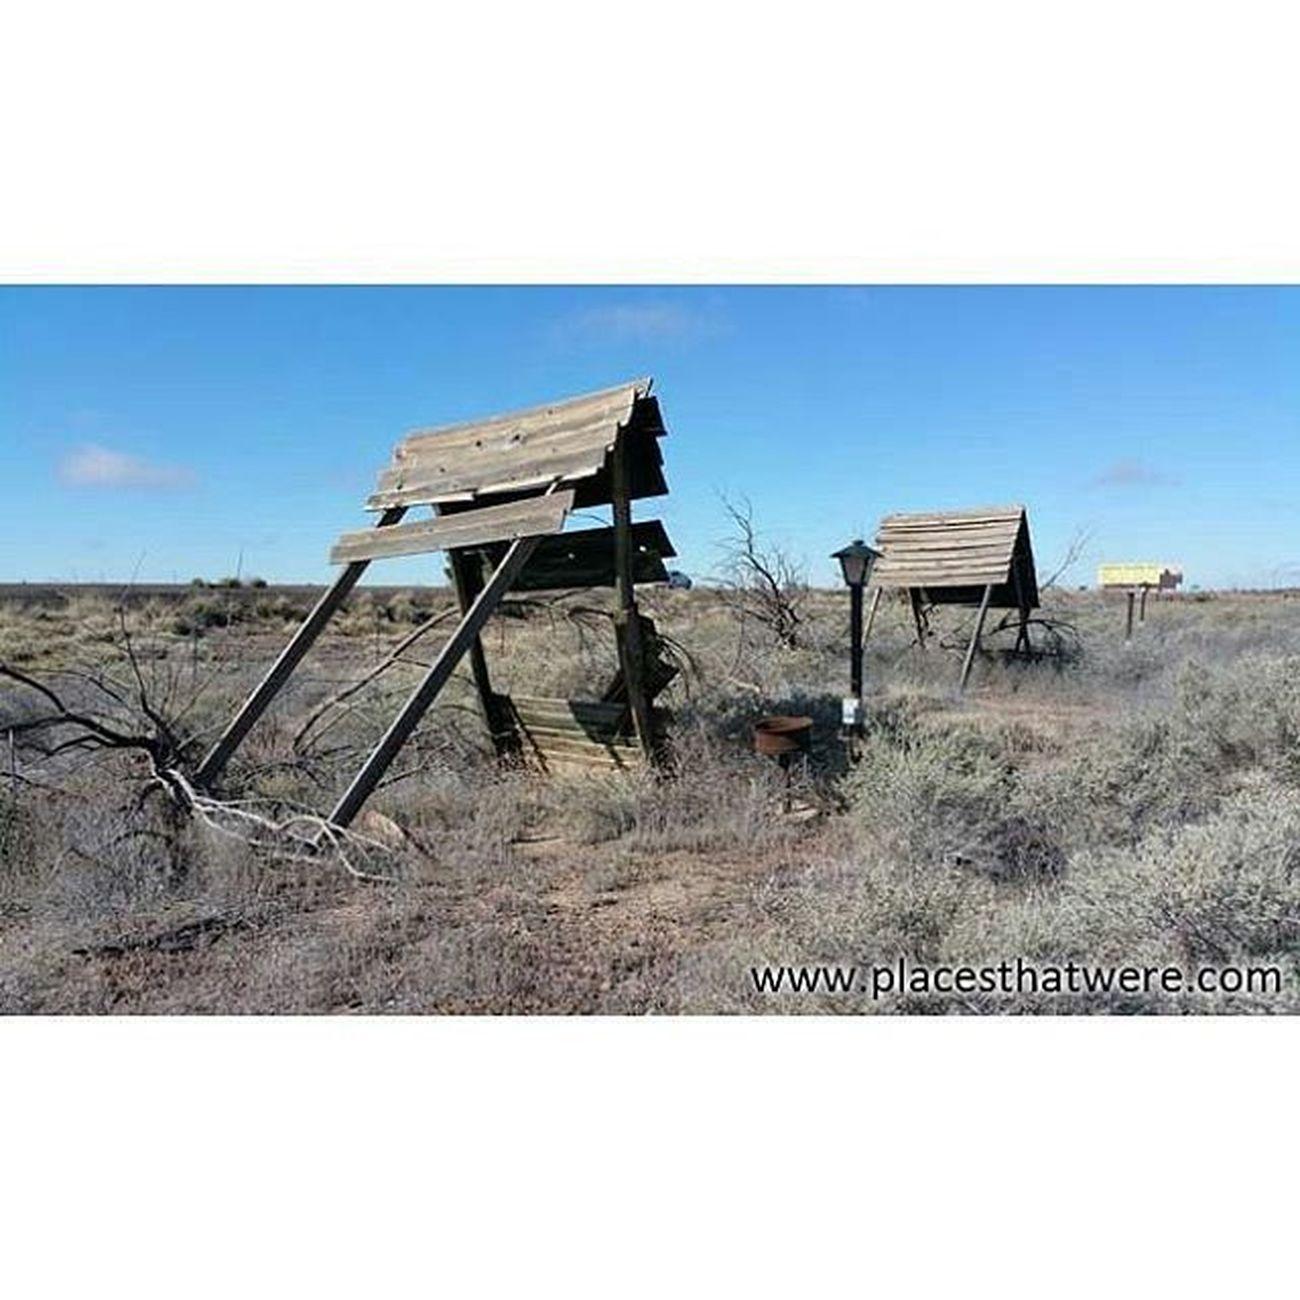 Abandoned Abandonedbuilding Abandonedplaces Arizona Camping Decay Forgottenplaces Ghosttowns Hopi Mormons  Navajo Roadtrip Route66 Rt66 Ruins RuralExploration Rurex Urbanexploration Urbex